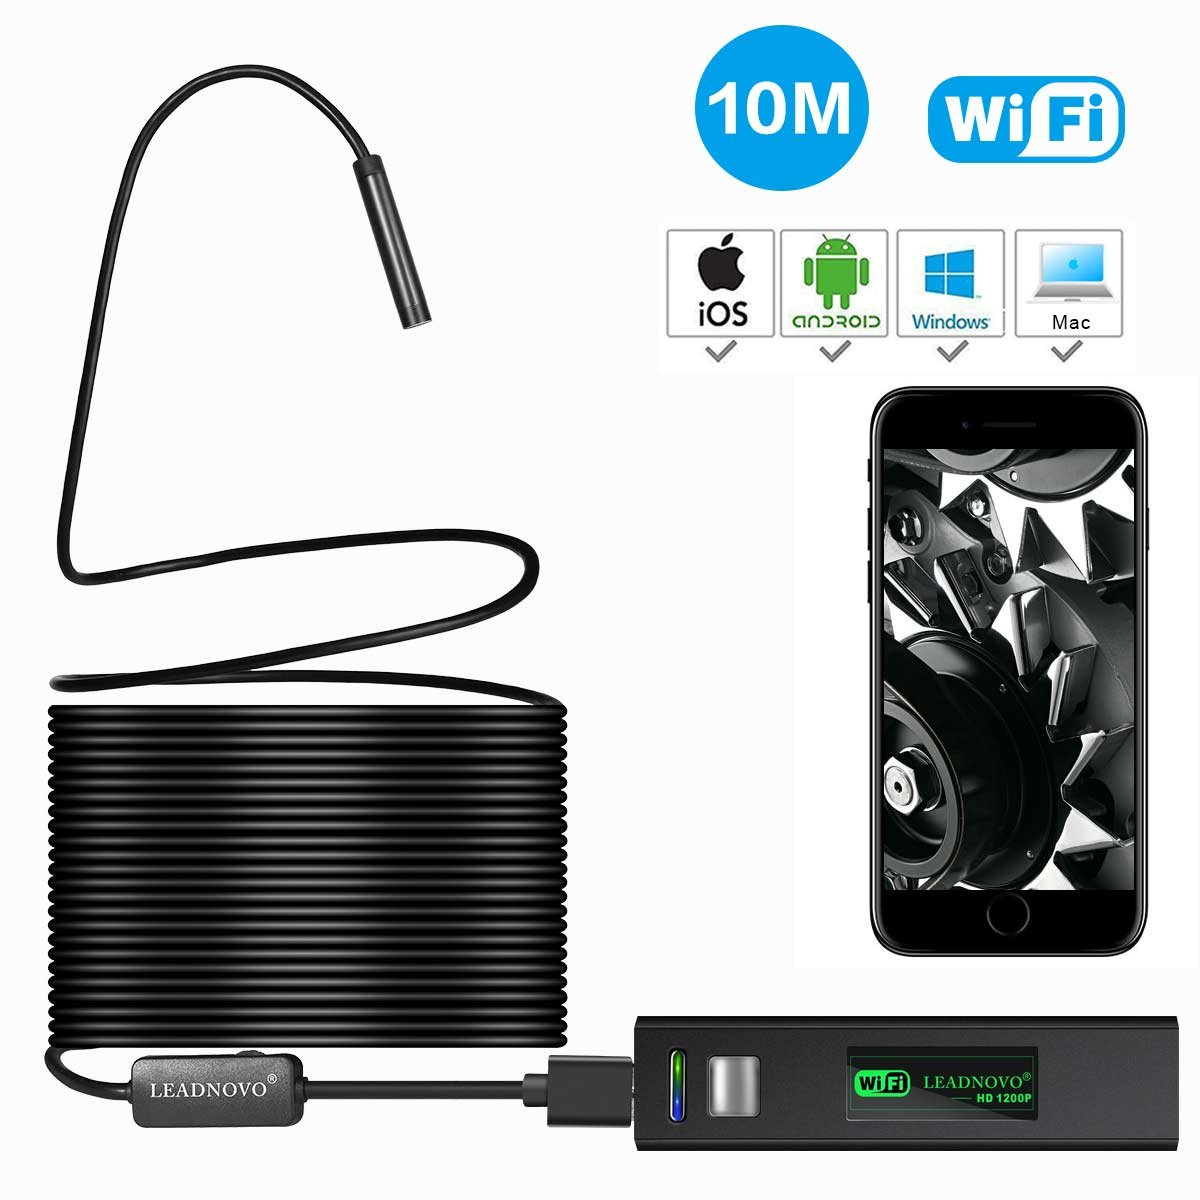 Amazon.com: Wireless Endoscope for iPhone Android, LEADNOVO WIFI ...